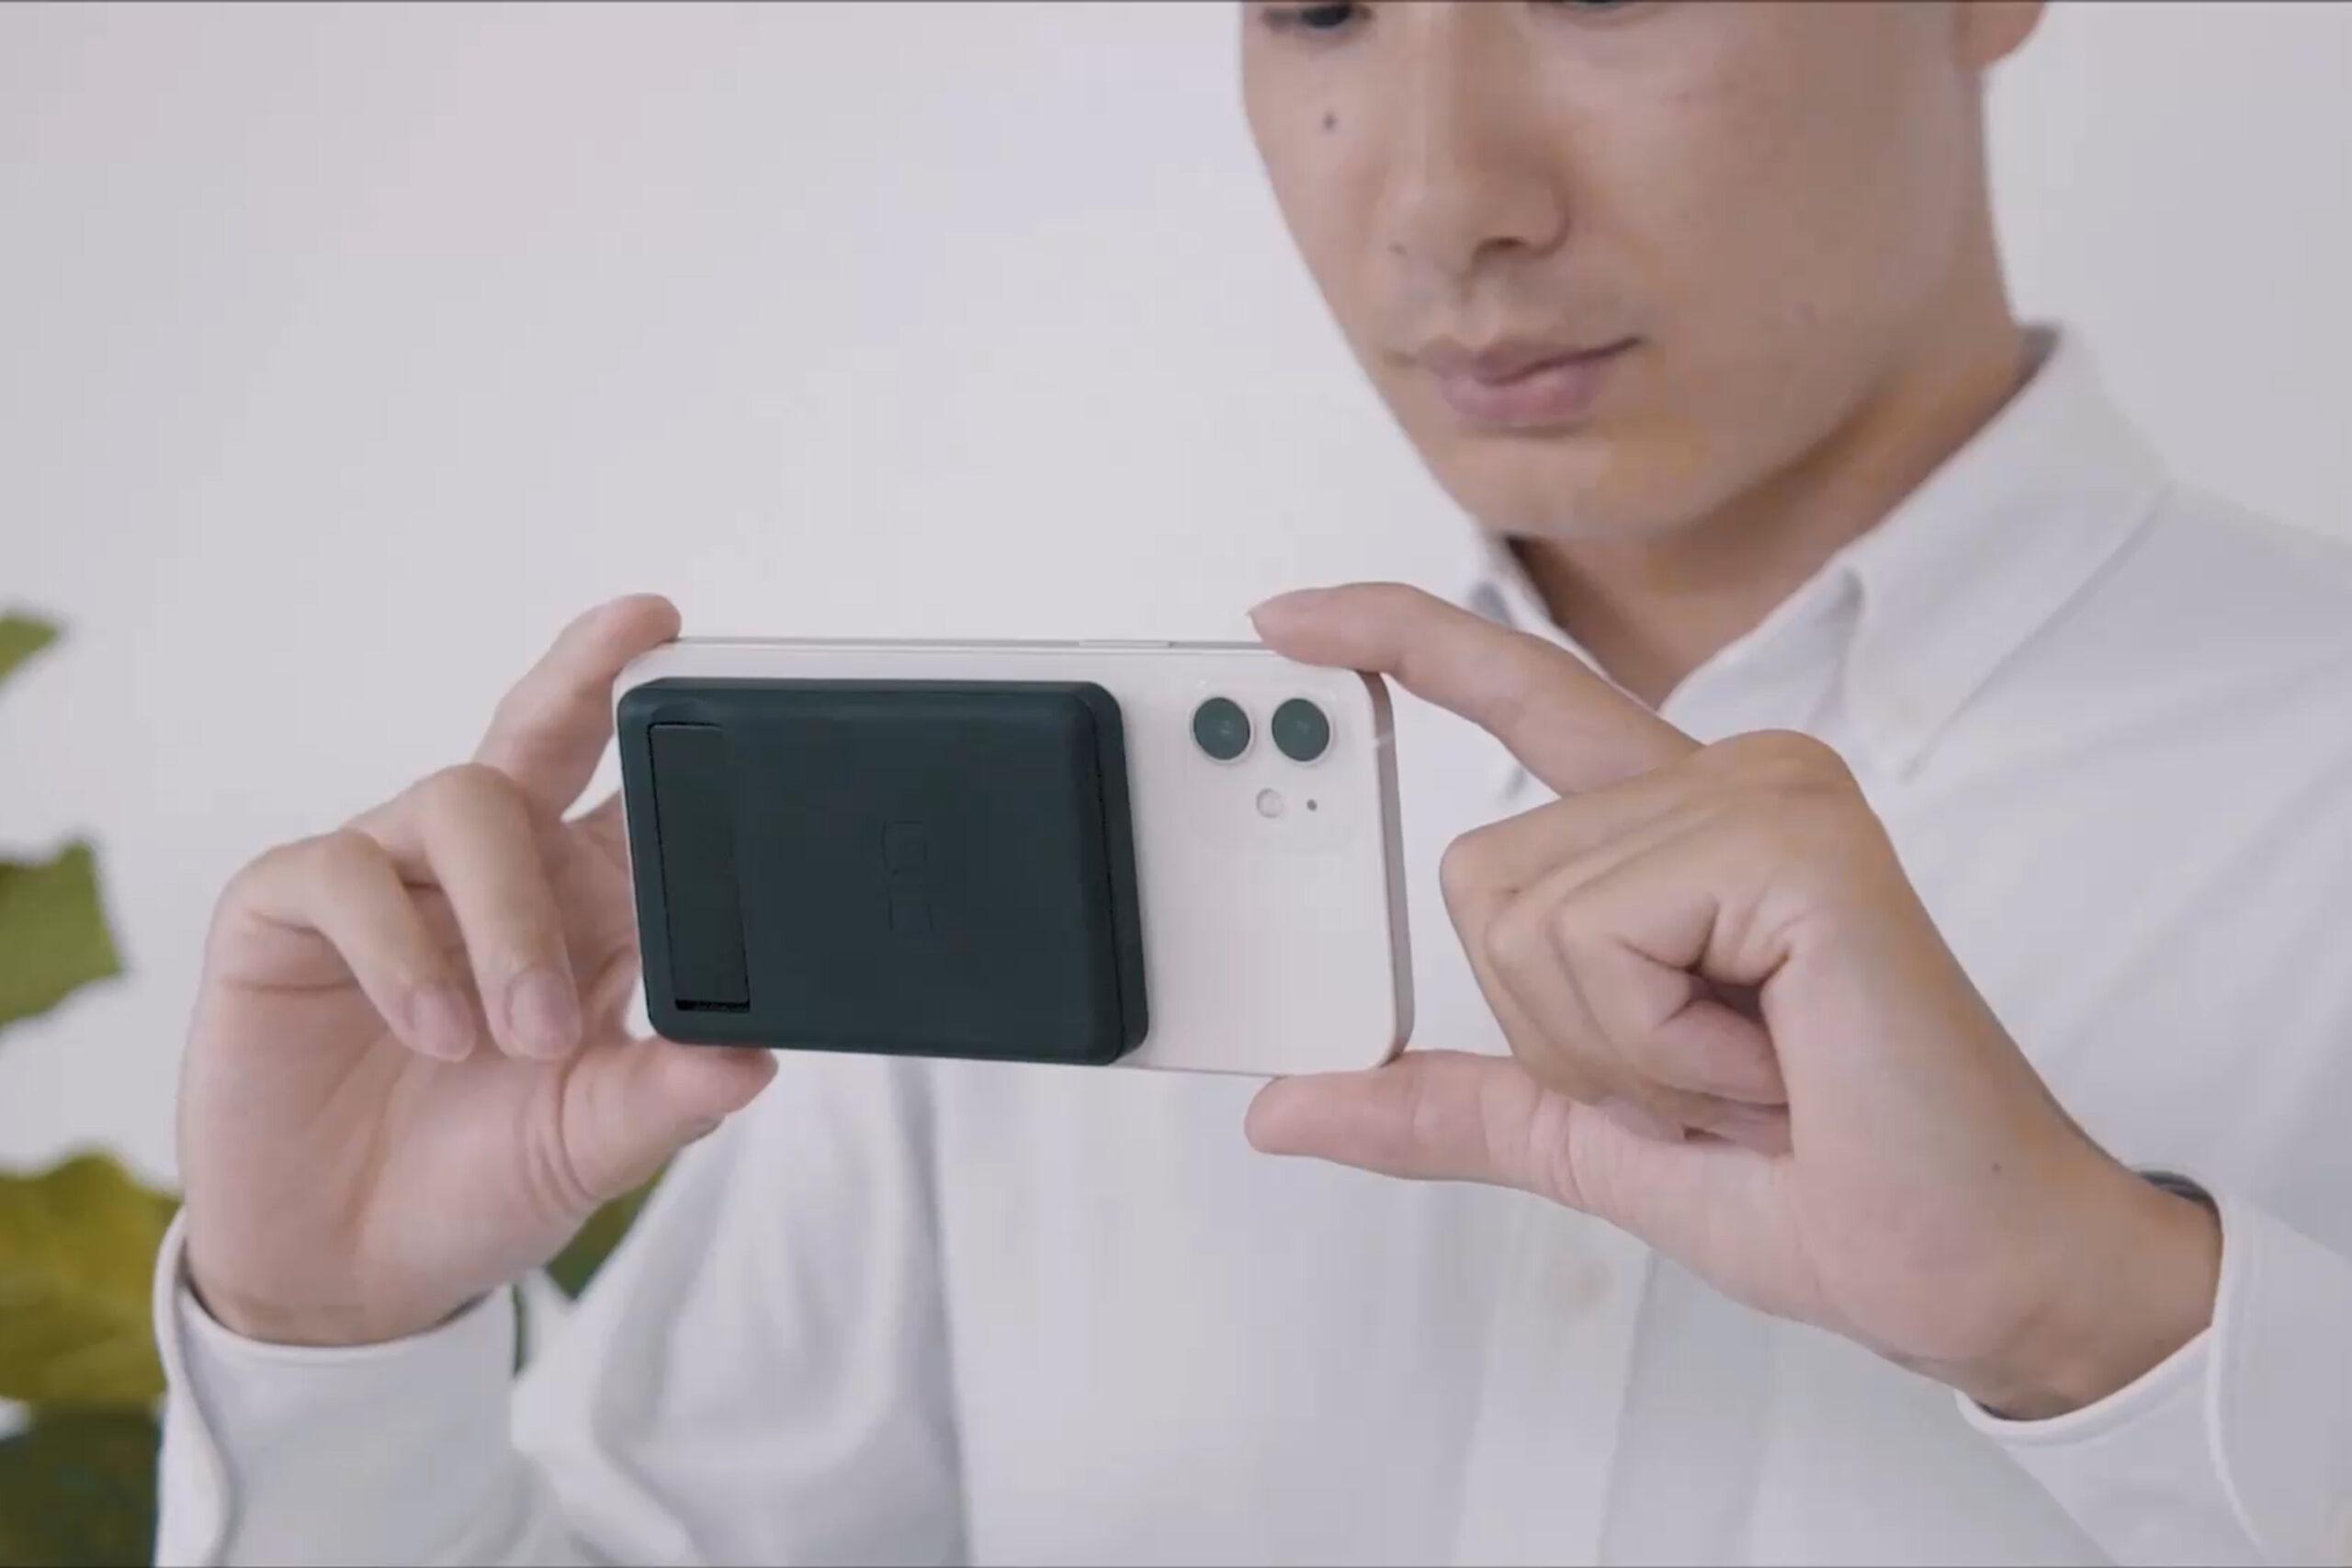 CIO: Apple Watch & MagSafe Compatible Power Bank